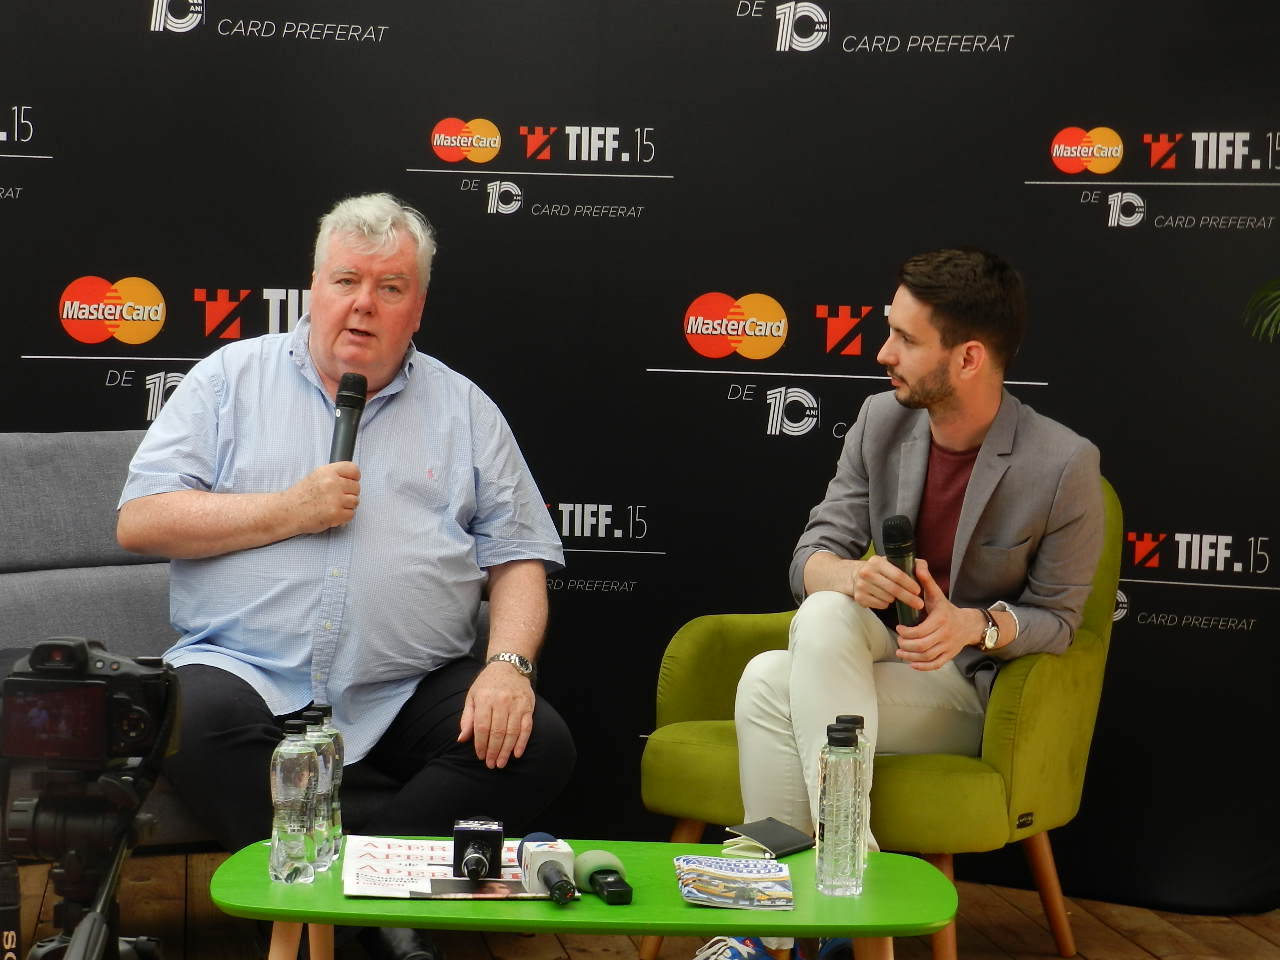 Iain Smith la TIFF 2016